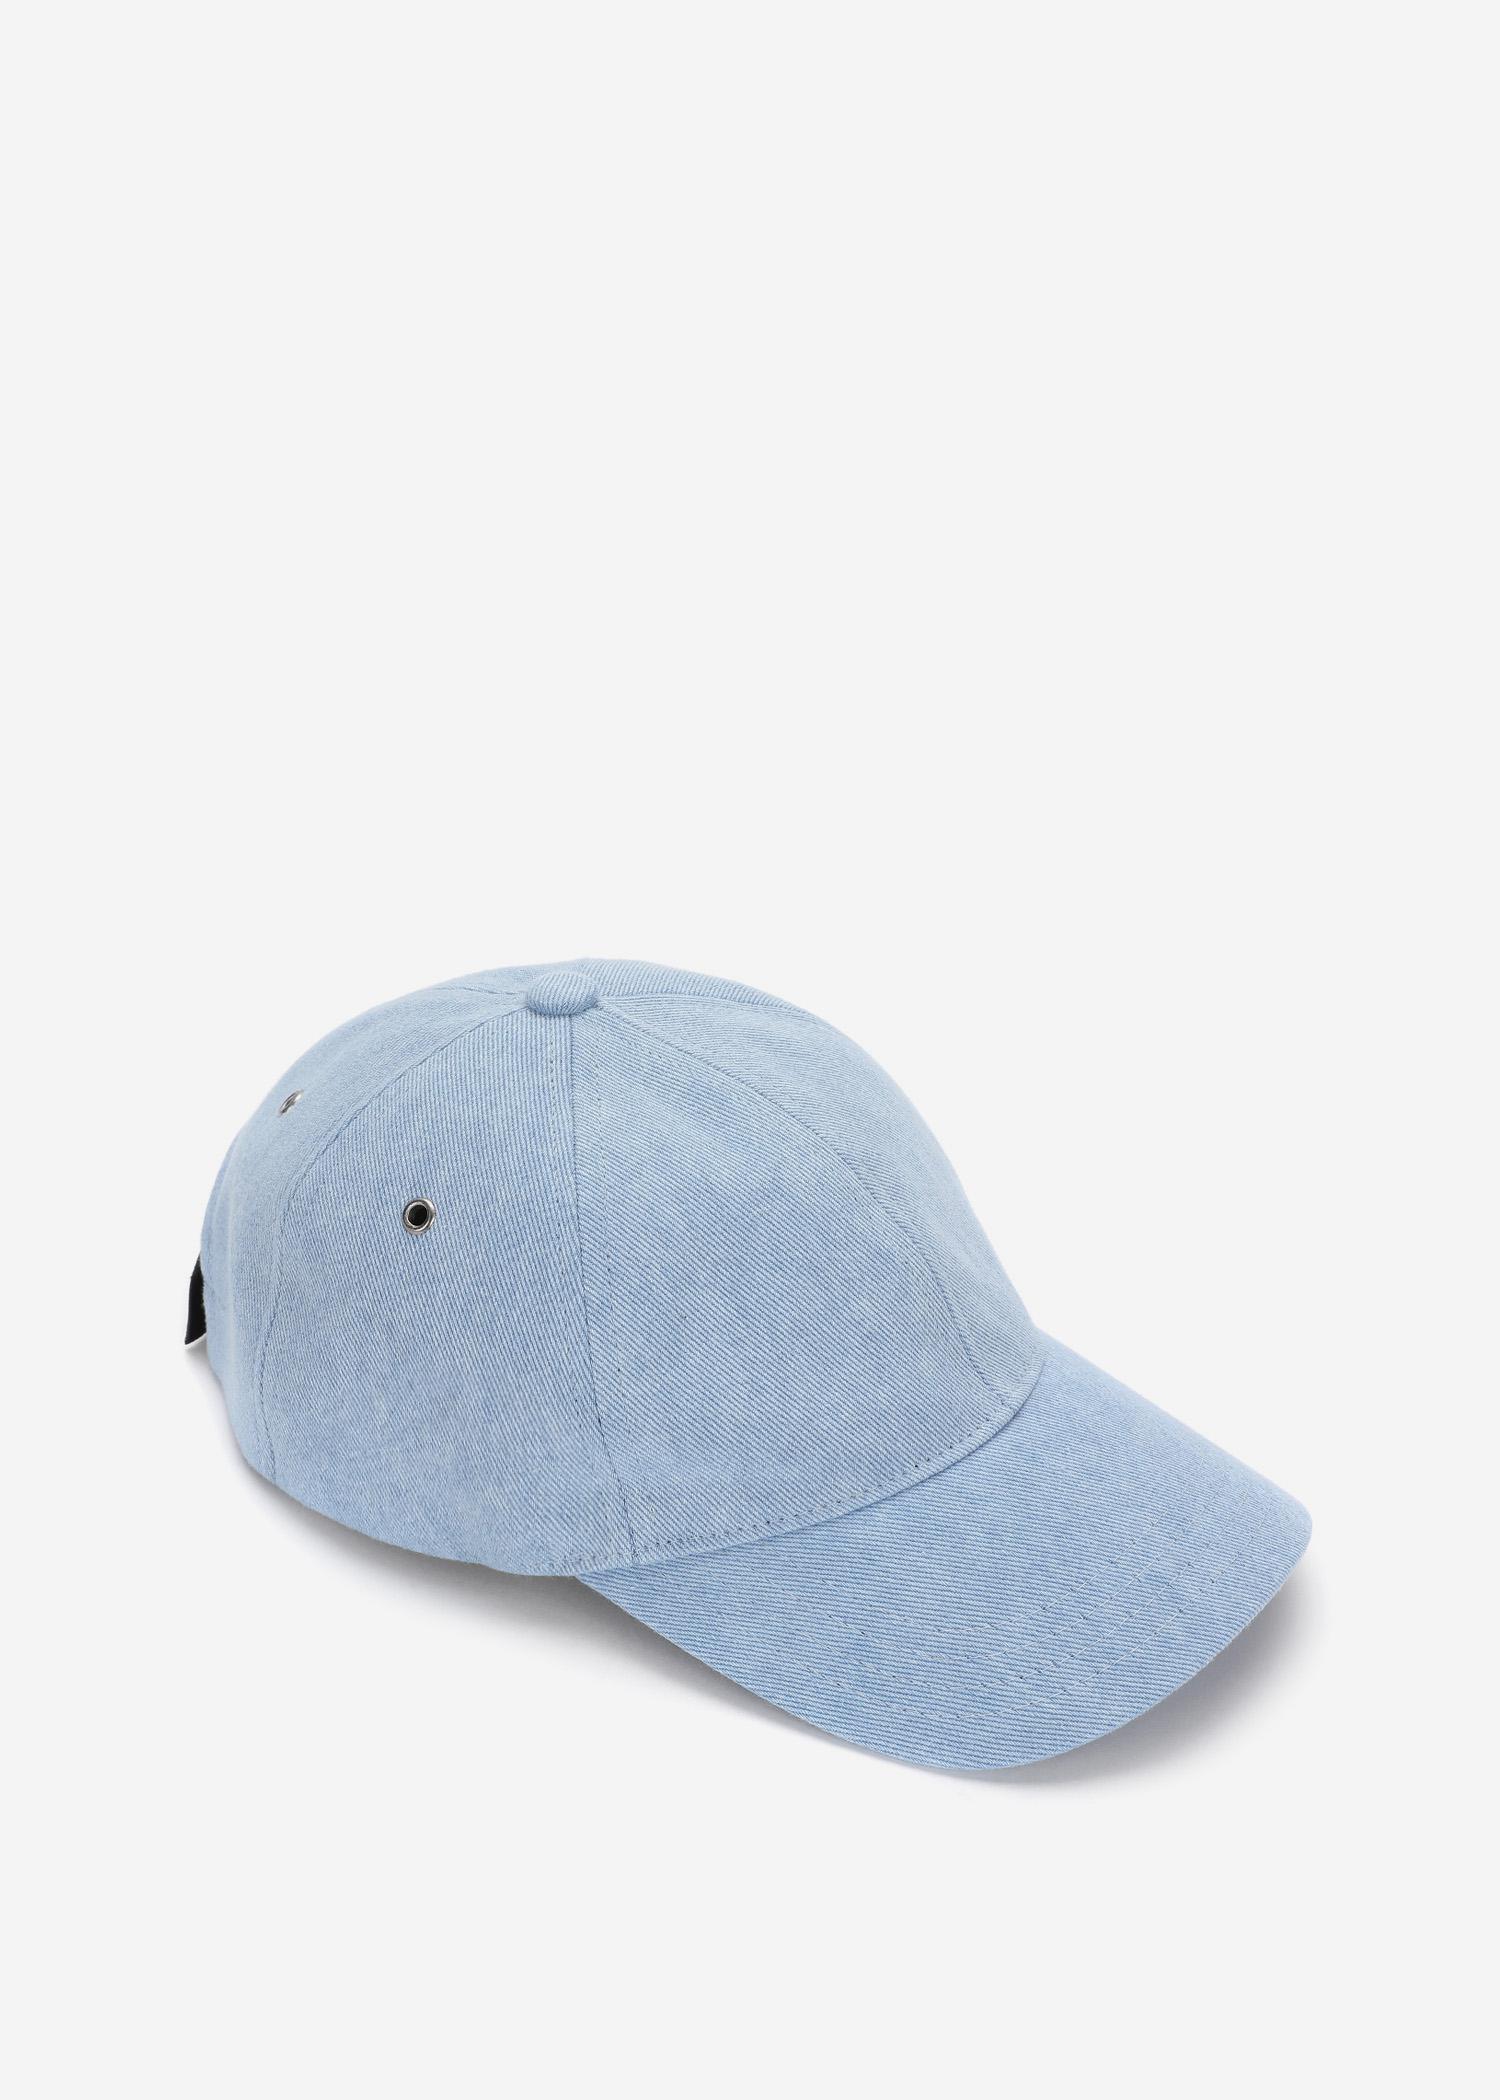 07bb17b556b A.P.C. Alex Baseball Cap in Blue for Men - Lyst